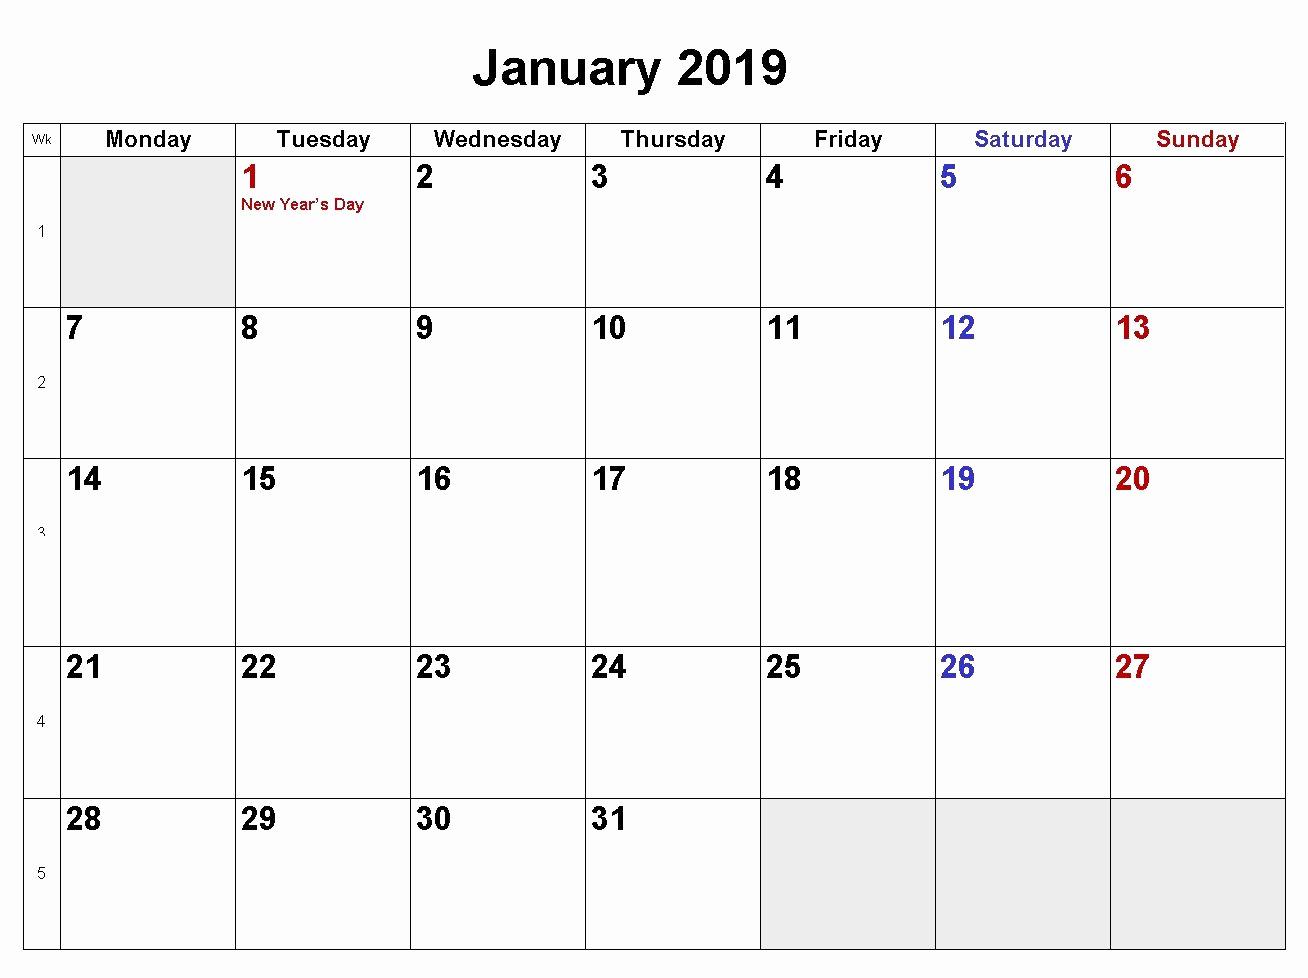 2019 Monthly Calendar Word Elegant January 2019 Calendar Download In Word Excel Pdf formats